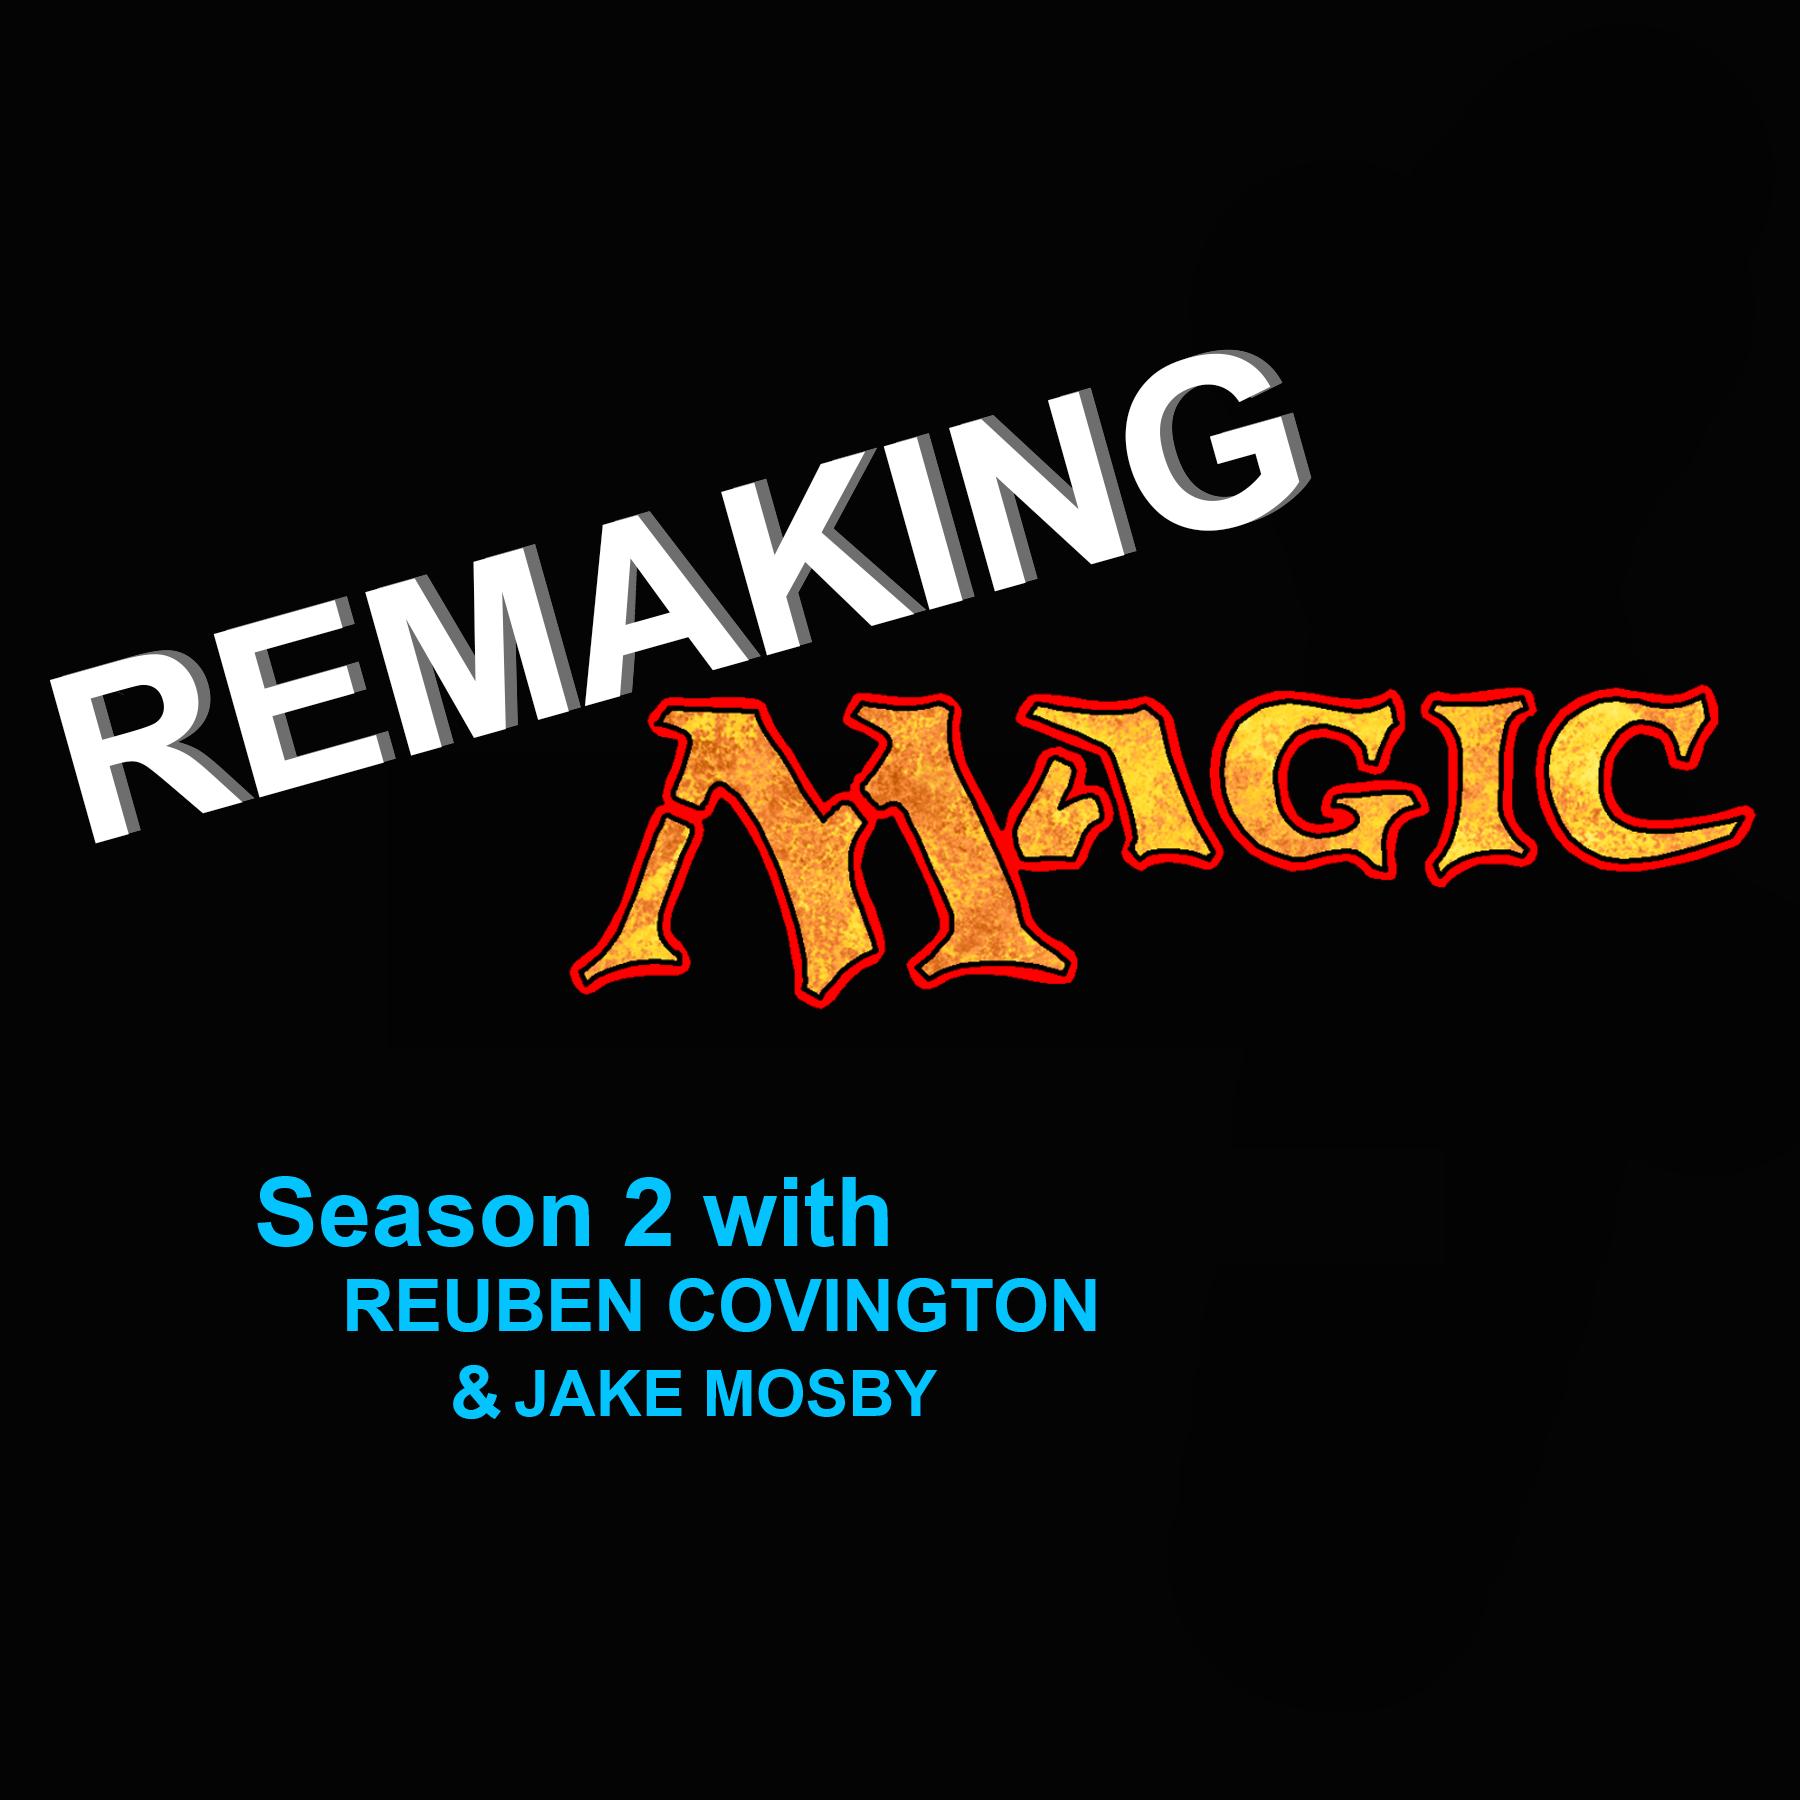 Re-Making Magic S02E07 - Contextual Design with Zefferal show art